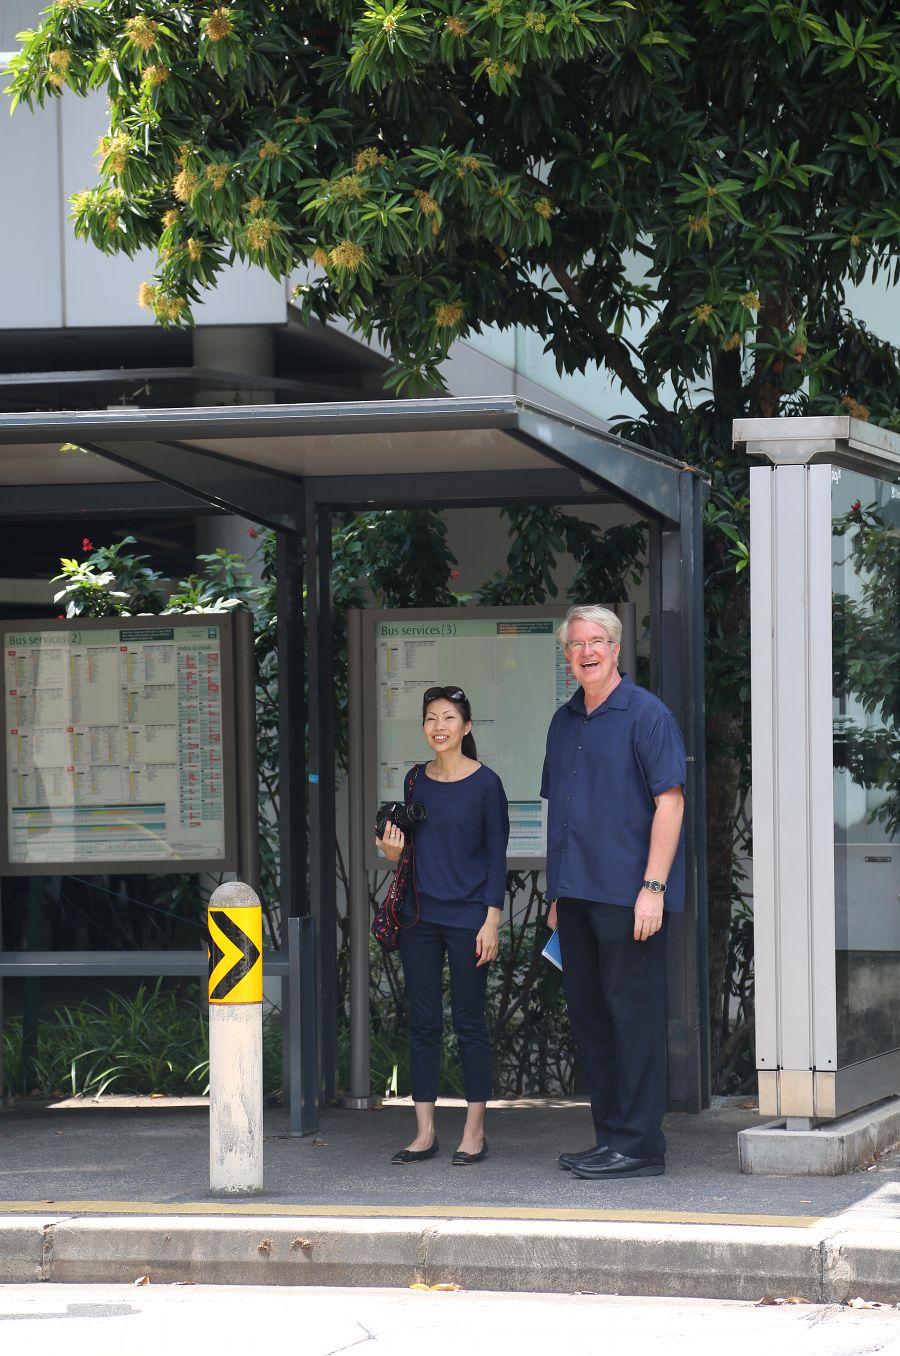 Cheryl Marie Cordeiro, Tom Estad, Singapore Management University campus, 2016